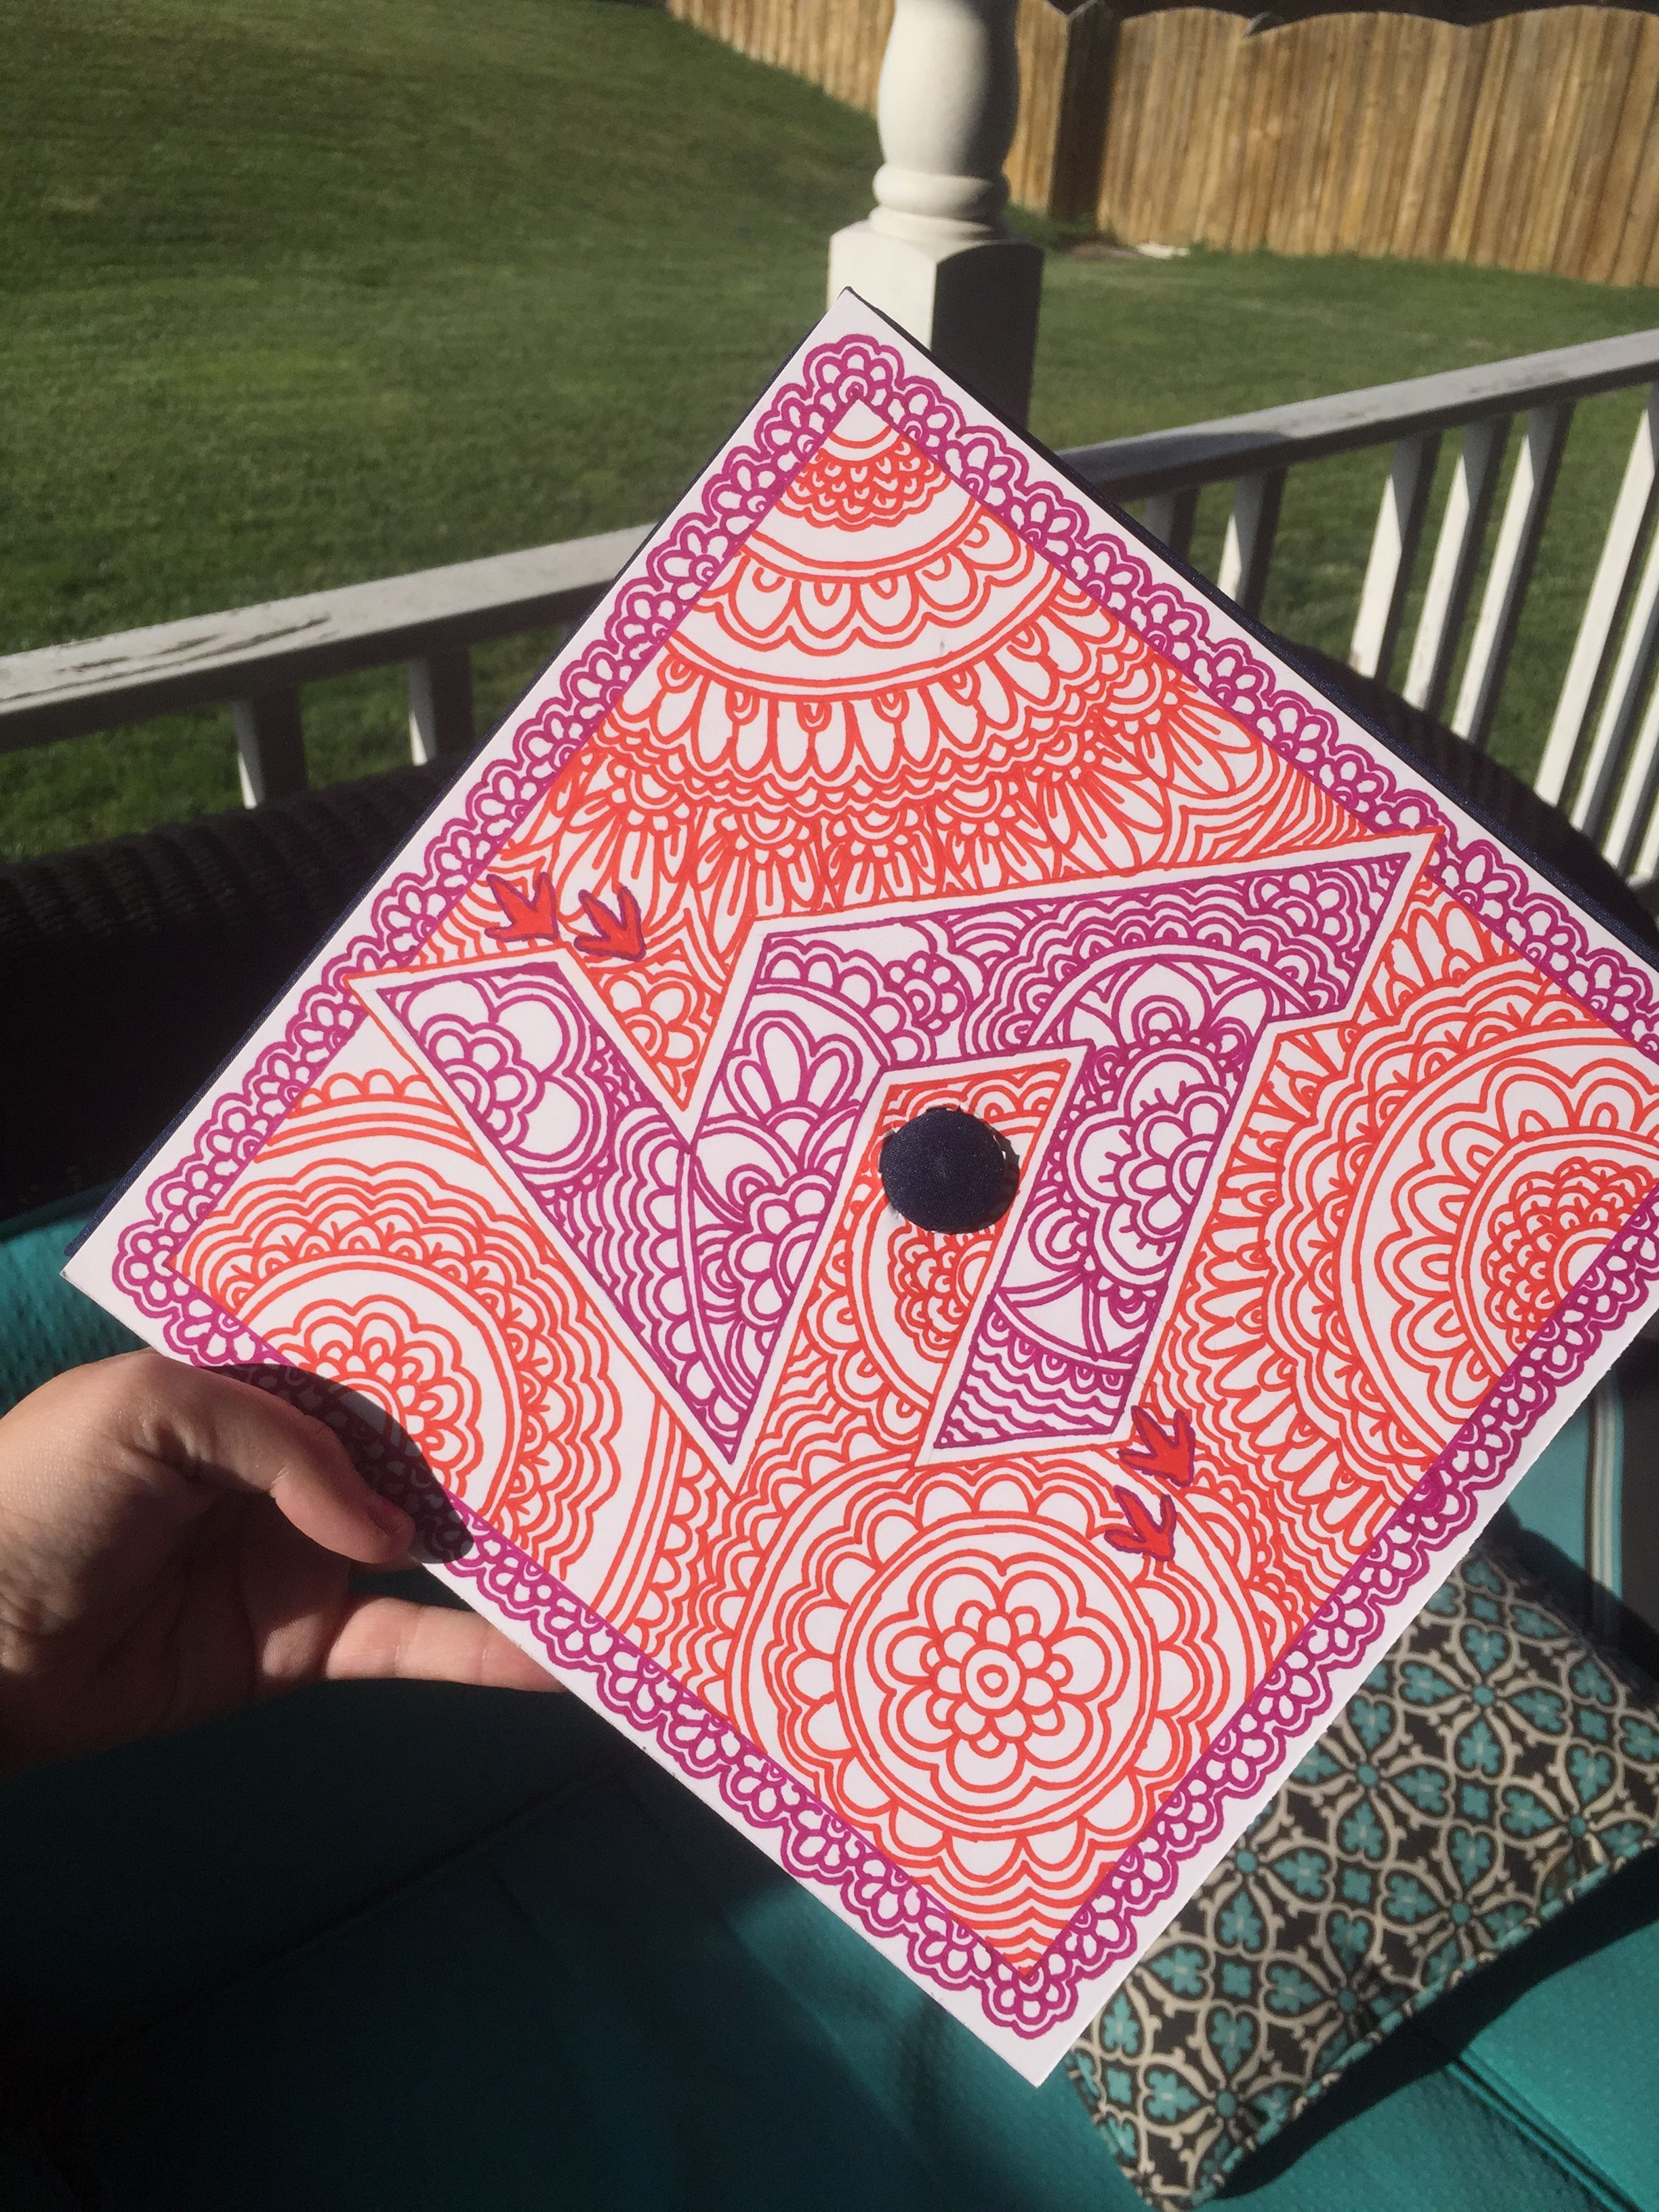 Virginia Tech Graduation Cap Graduation cap decoration